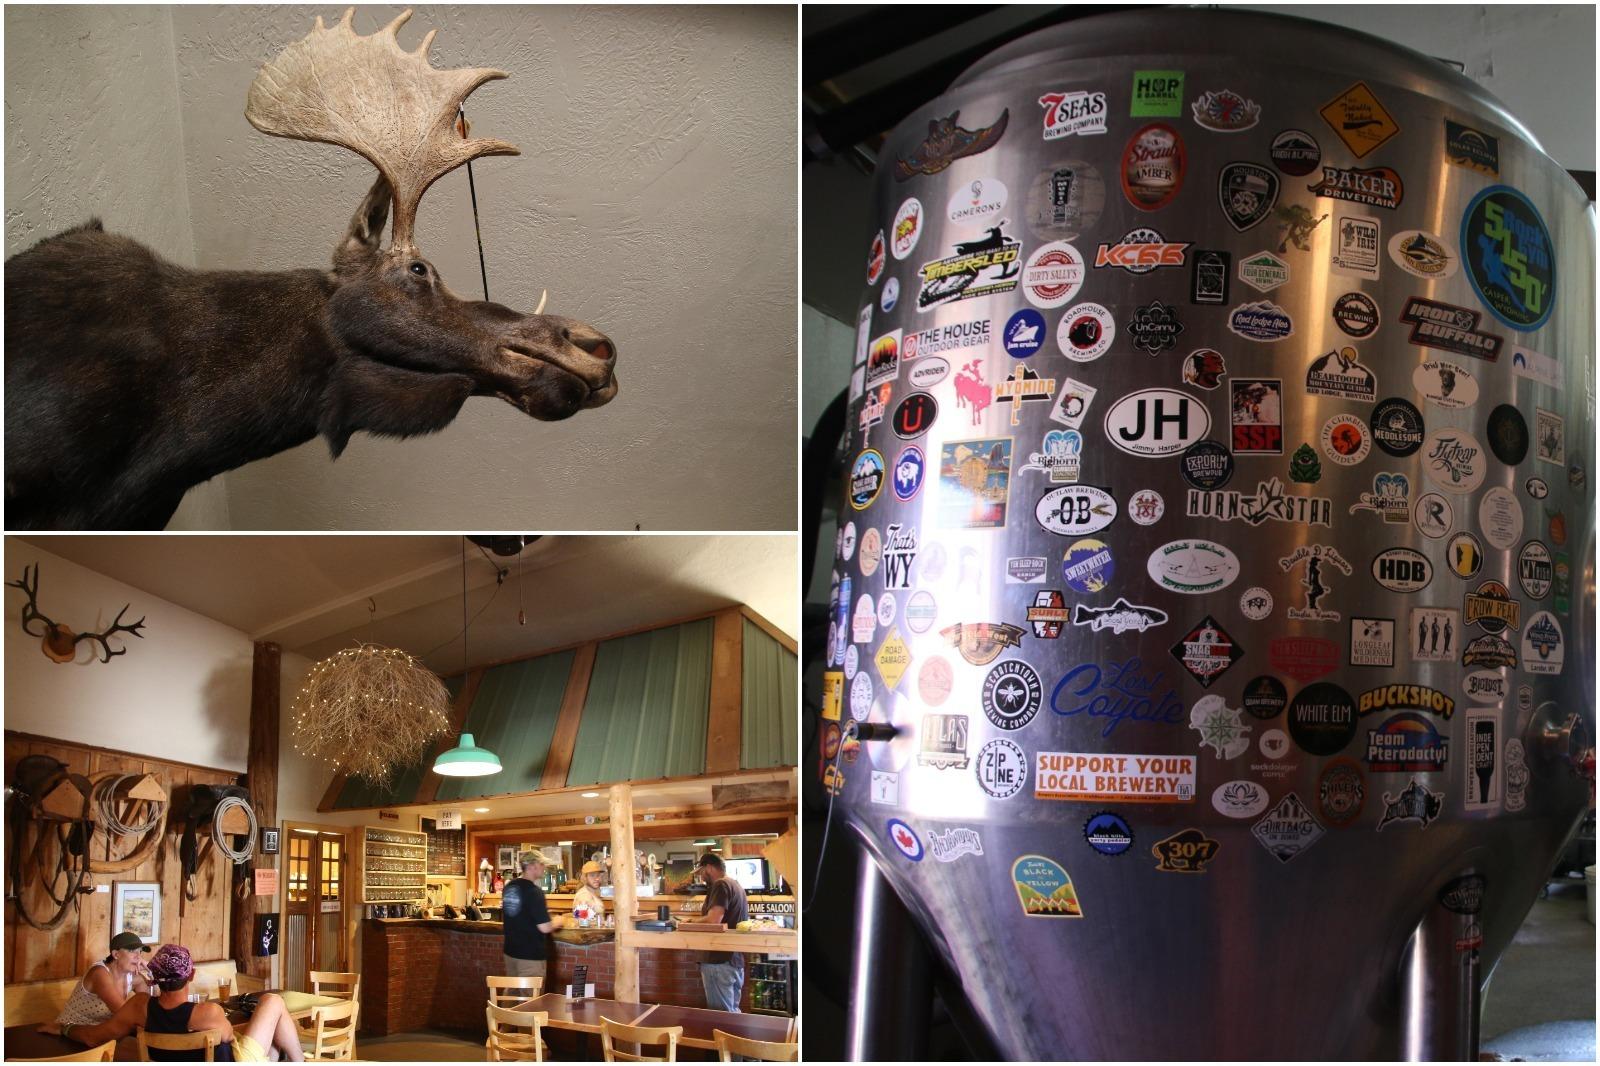 Interior images of Tensleep Brewing company in Tensleep, Wyoming.